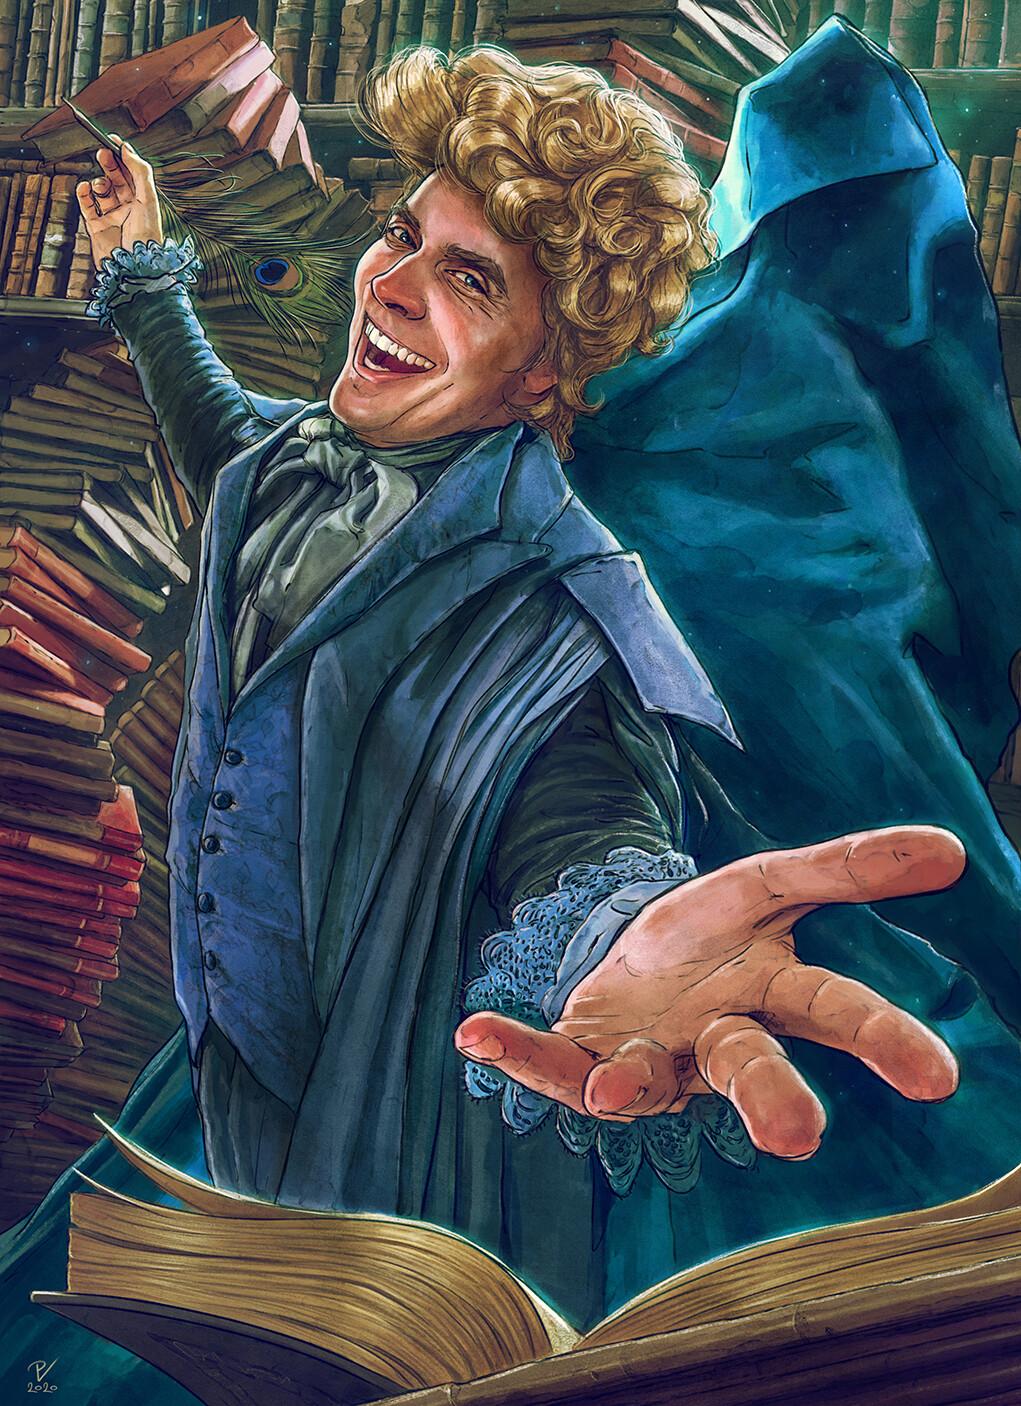 ArtStation - Harry Potter and the Chamber of Secrets-FanArt-06, Vladislav  Pantic